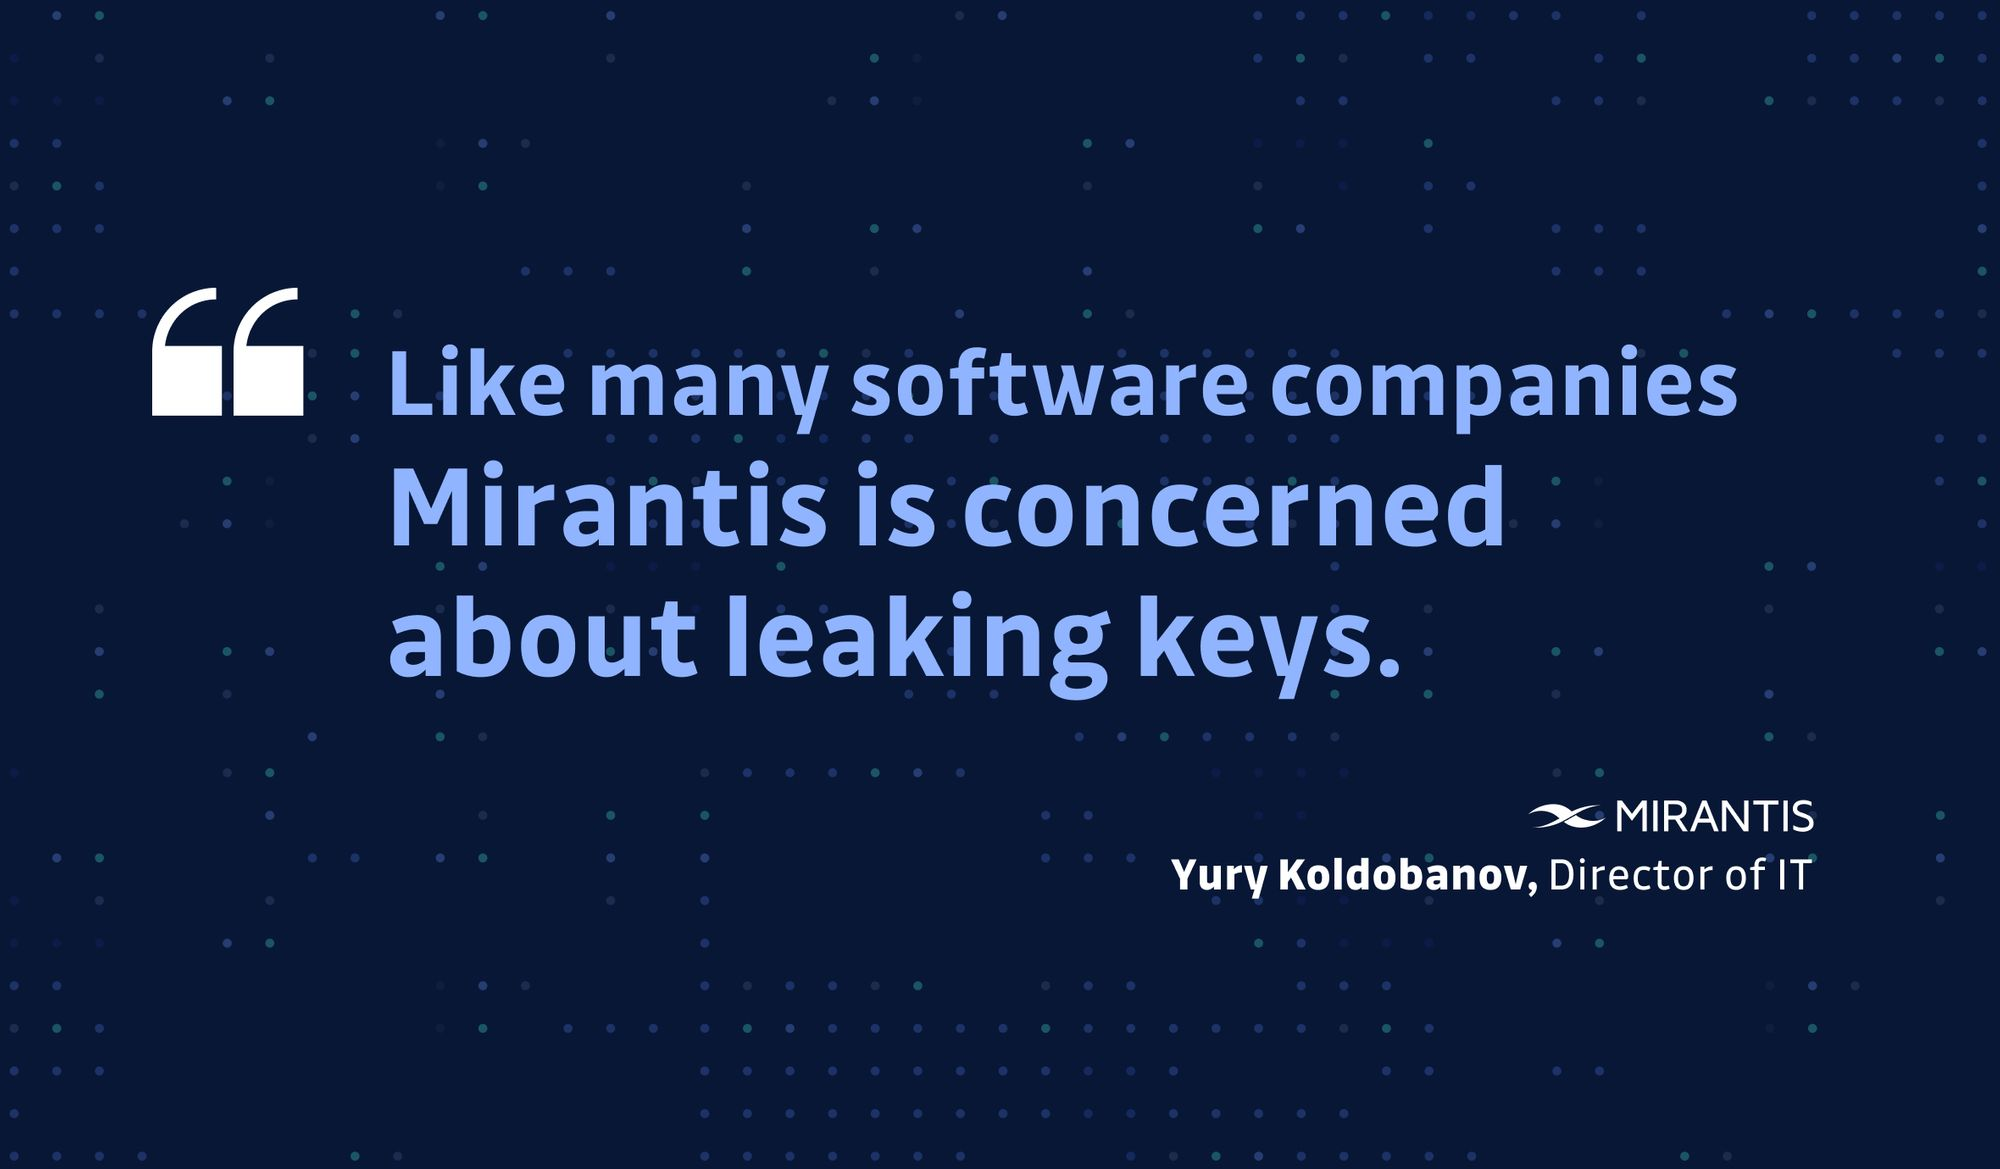 CISO Live - Yury Koldobanov from Mirantis